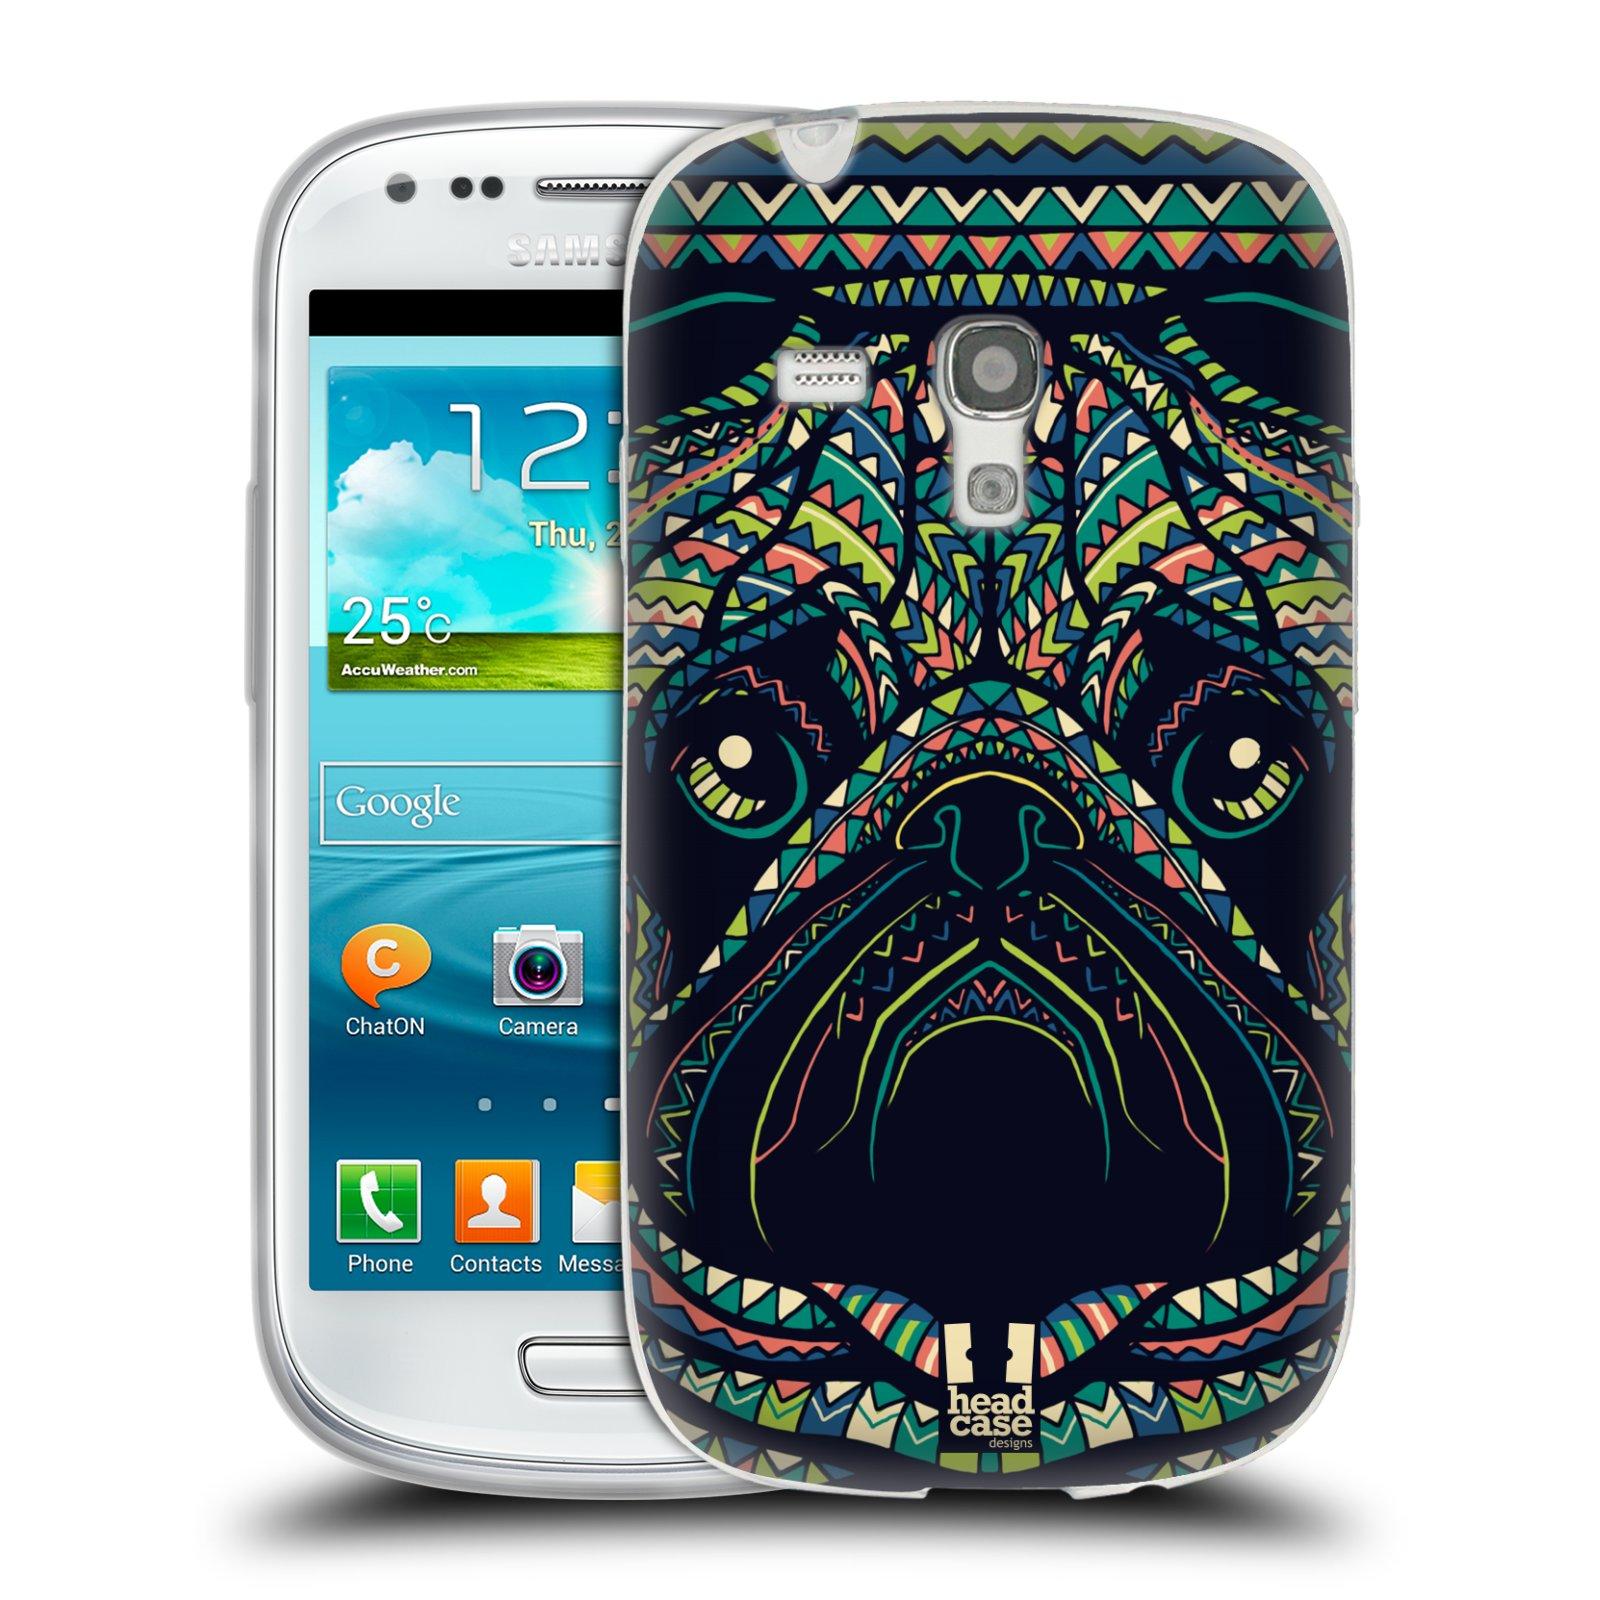 Silikonové pouzdro na mobil Samsung Galaxy S III Mini HEAD CASE AZTEC MOPS (Silikonový kryt či obal na mobilní telefon Samsung Galaxy S III Mini GT-i8190)